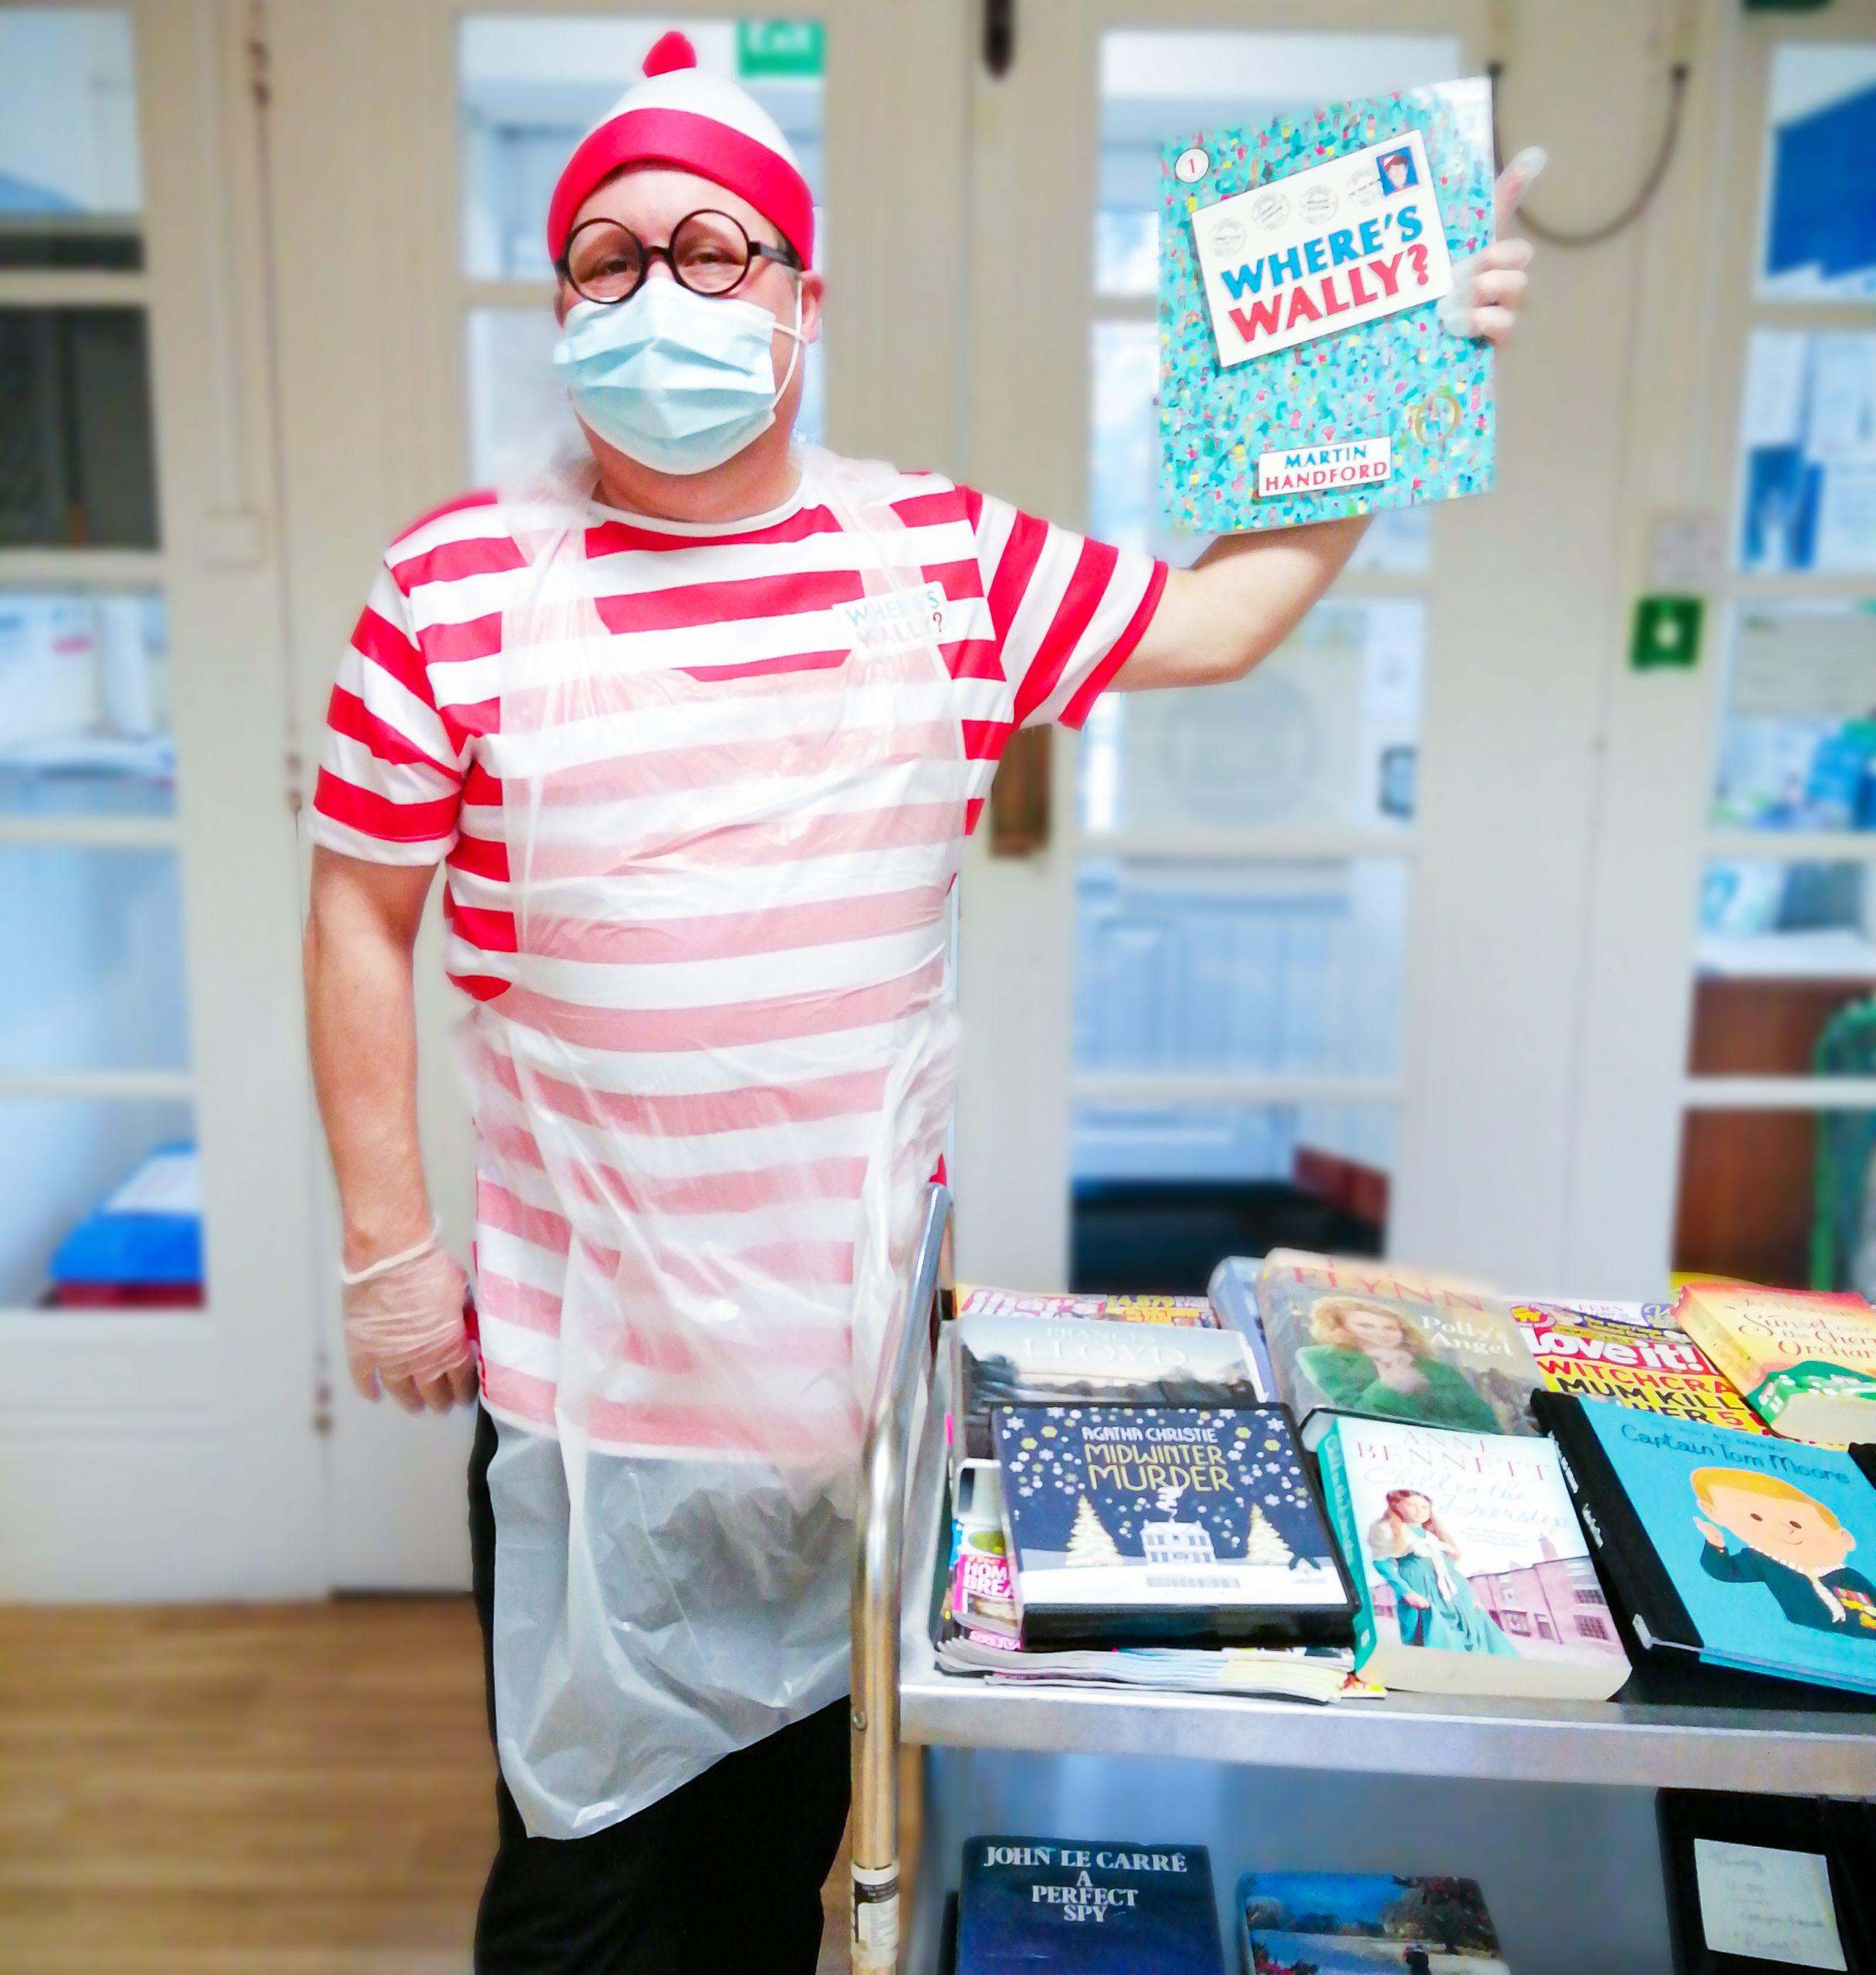 Rob dressed as Wally